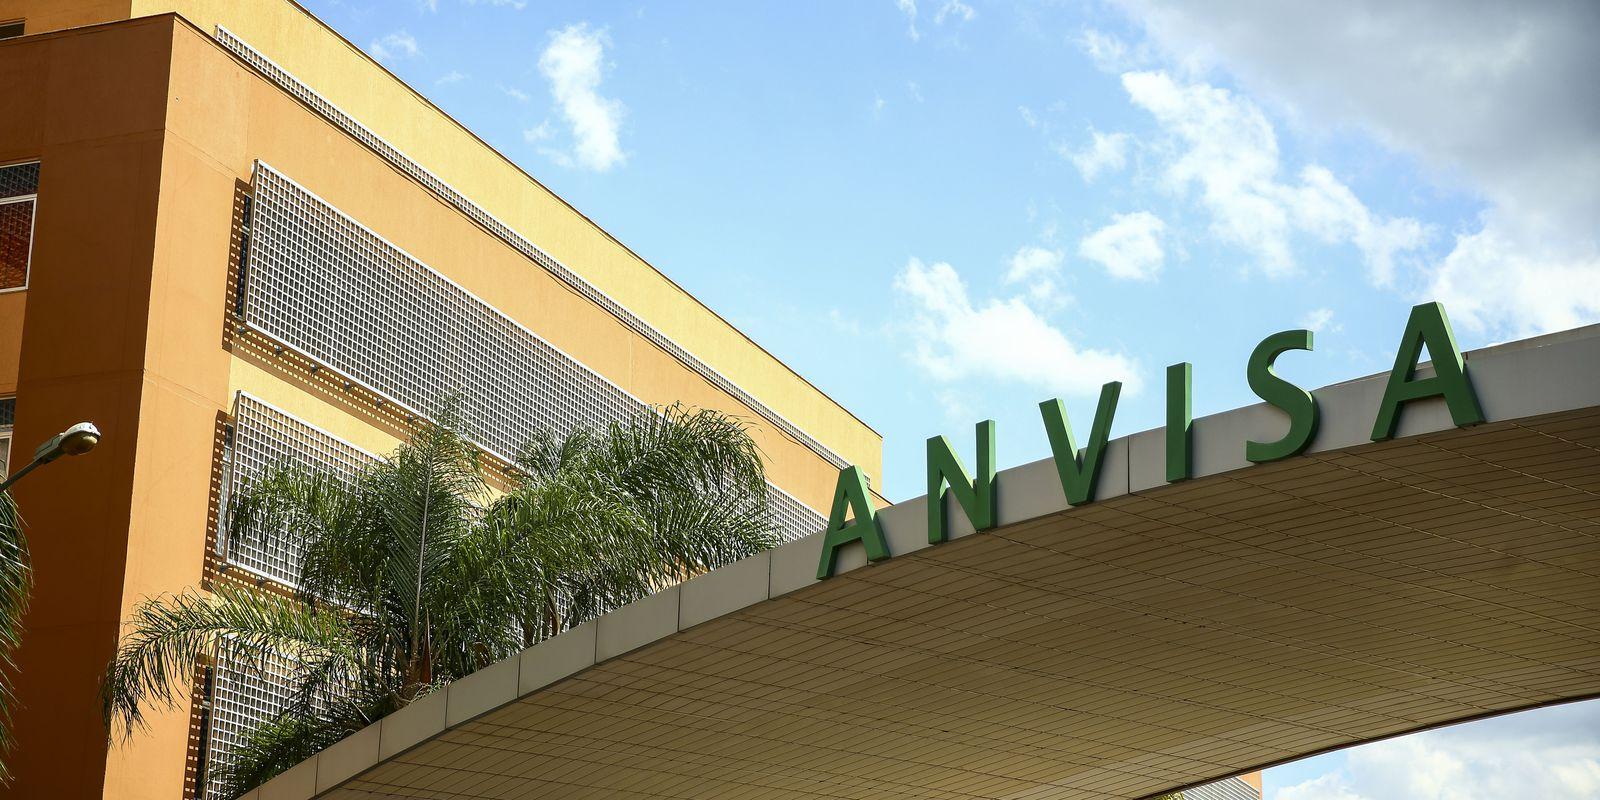 Anvisa autoriza novo ensaio clínico de vacina contra covid-19 | Agência  Brasil